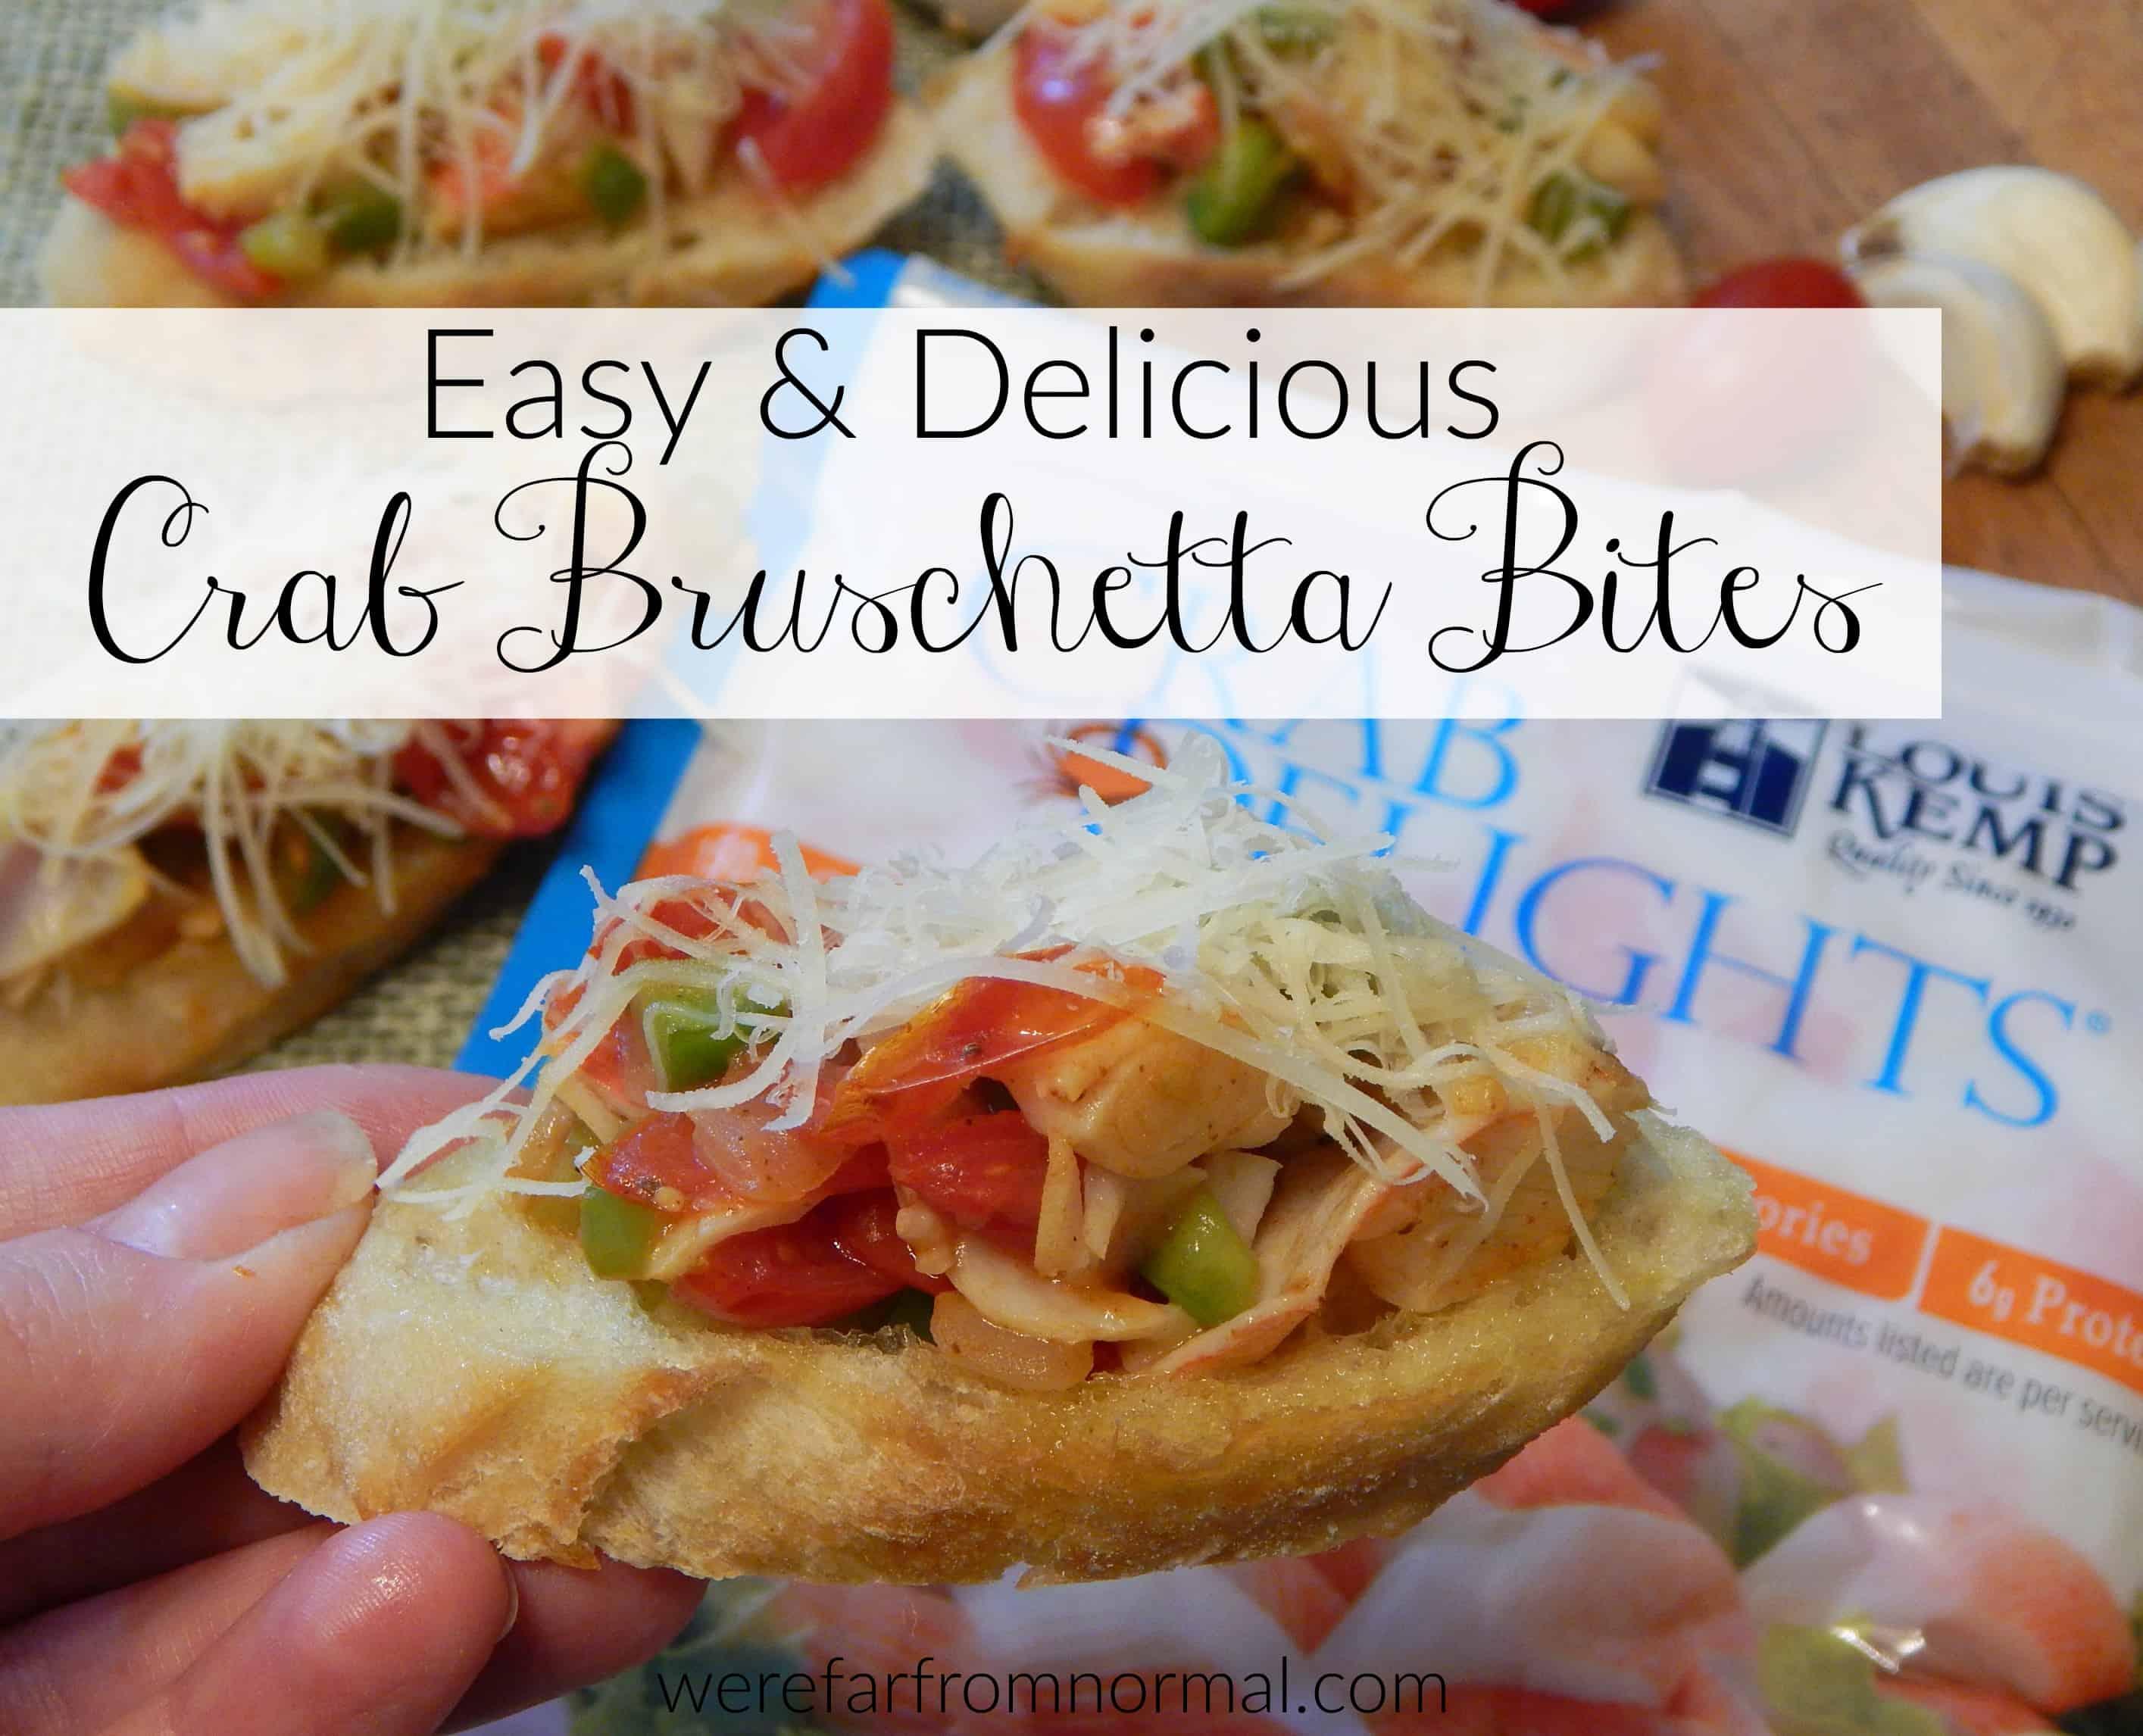 Crab Bruschetta Bites – Easy & Delicious!